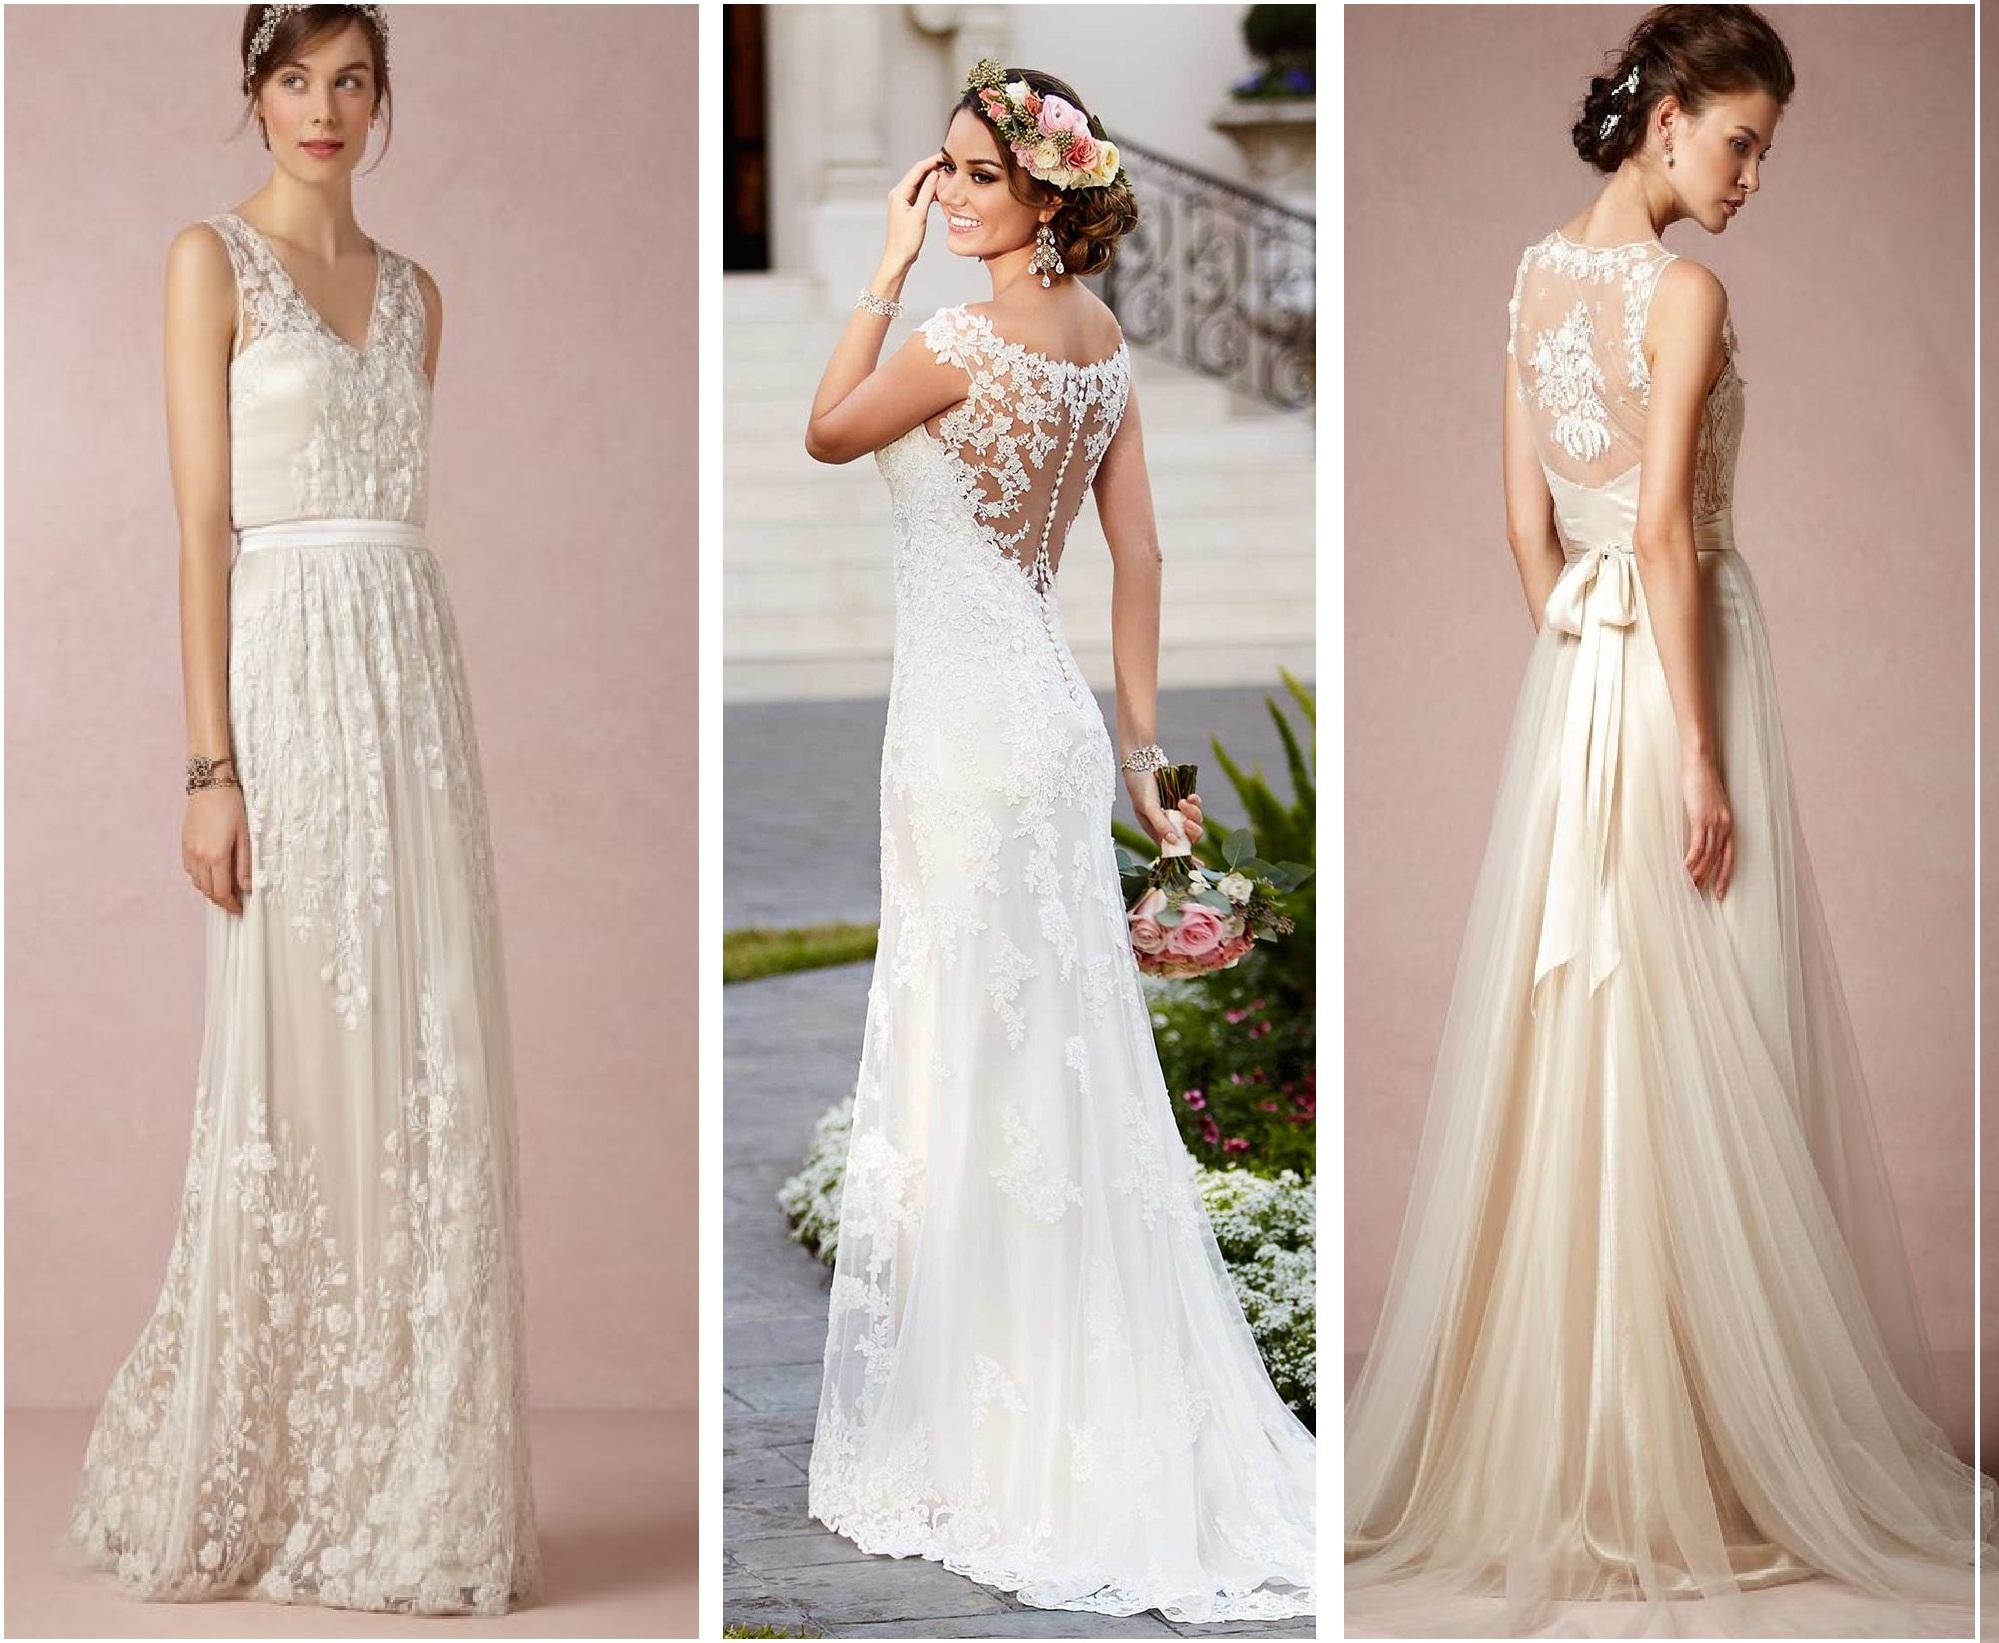 Latest Western Wedding Dresses Bridal Gowns 2017-2018